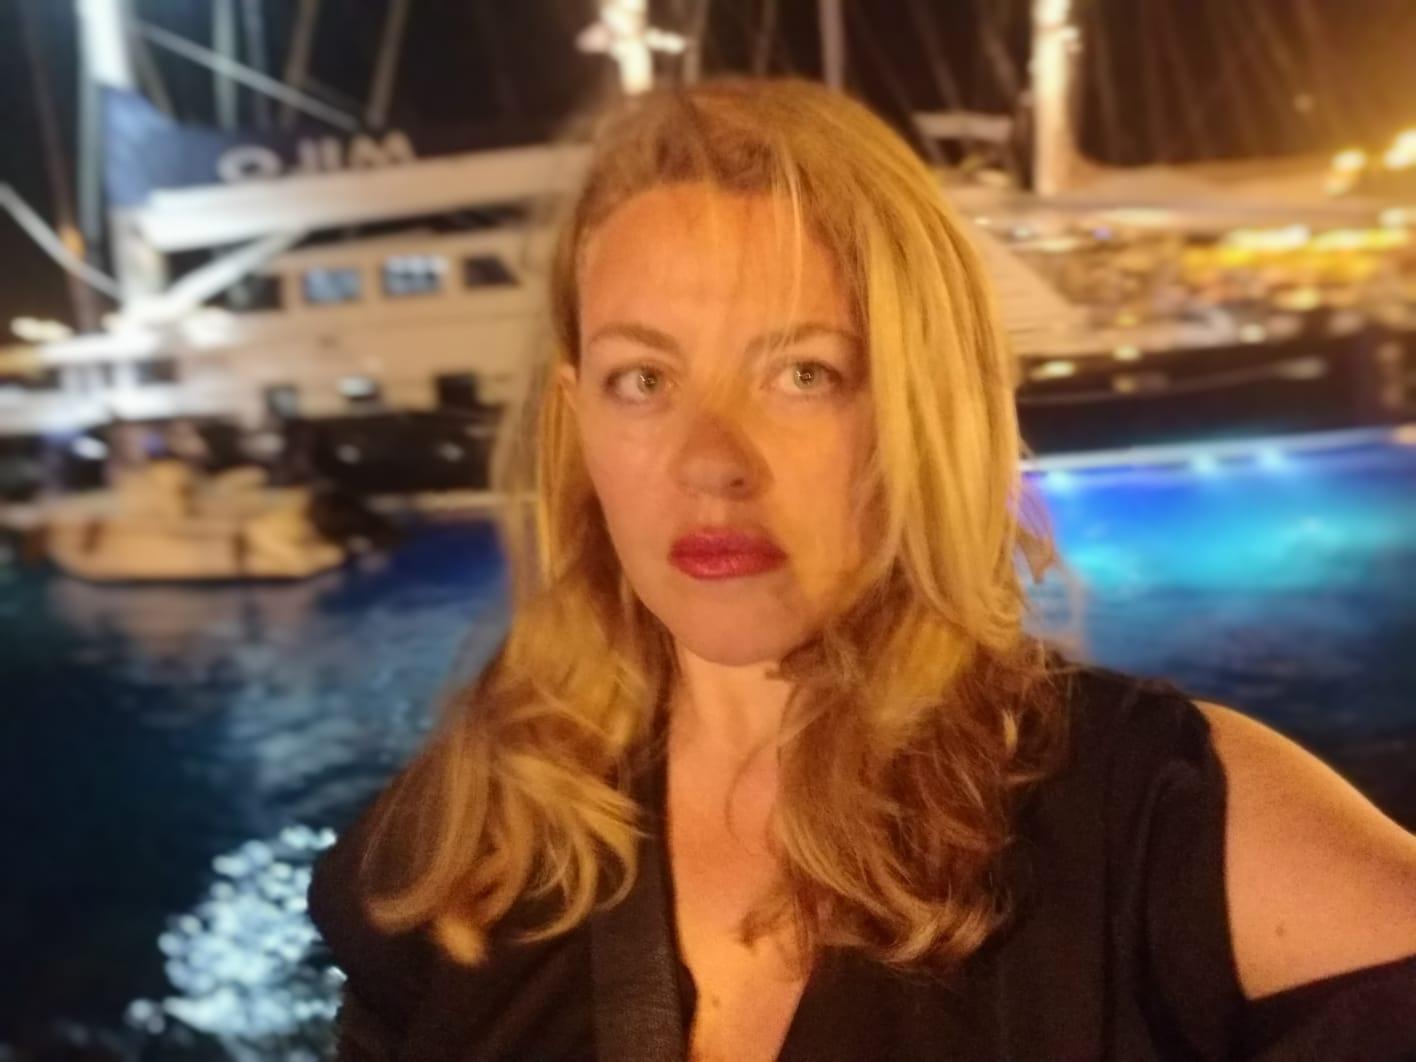 Melinda Miceli ambasciatrice onoraria internazionale di Ediciones Matrioska